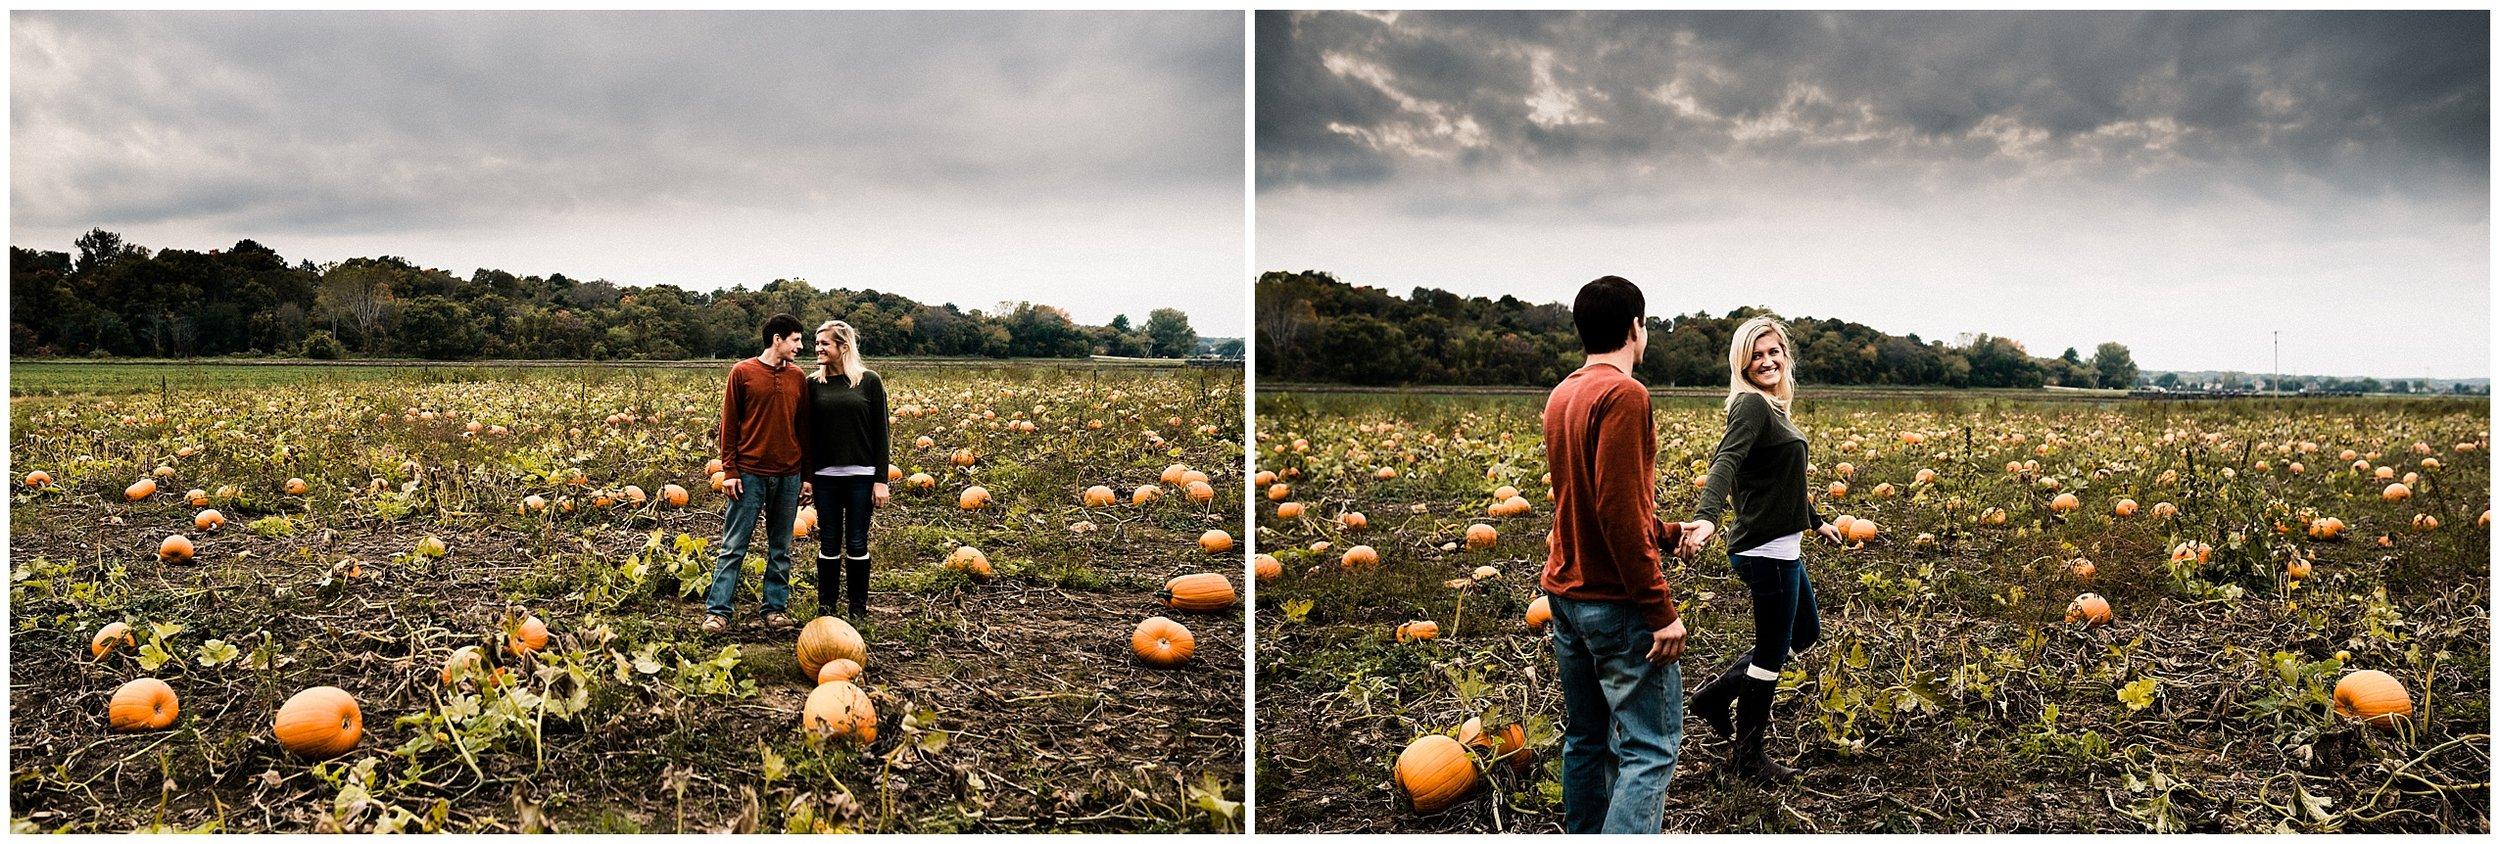 Alex + Taylor   Engaged #kyleepaigephotography_1686.jpg